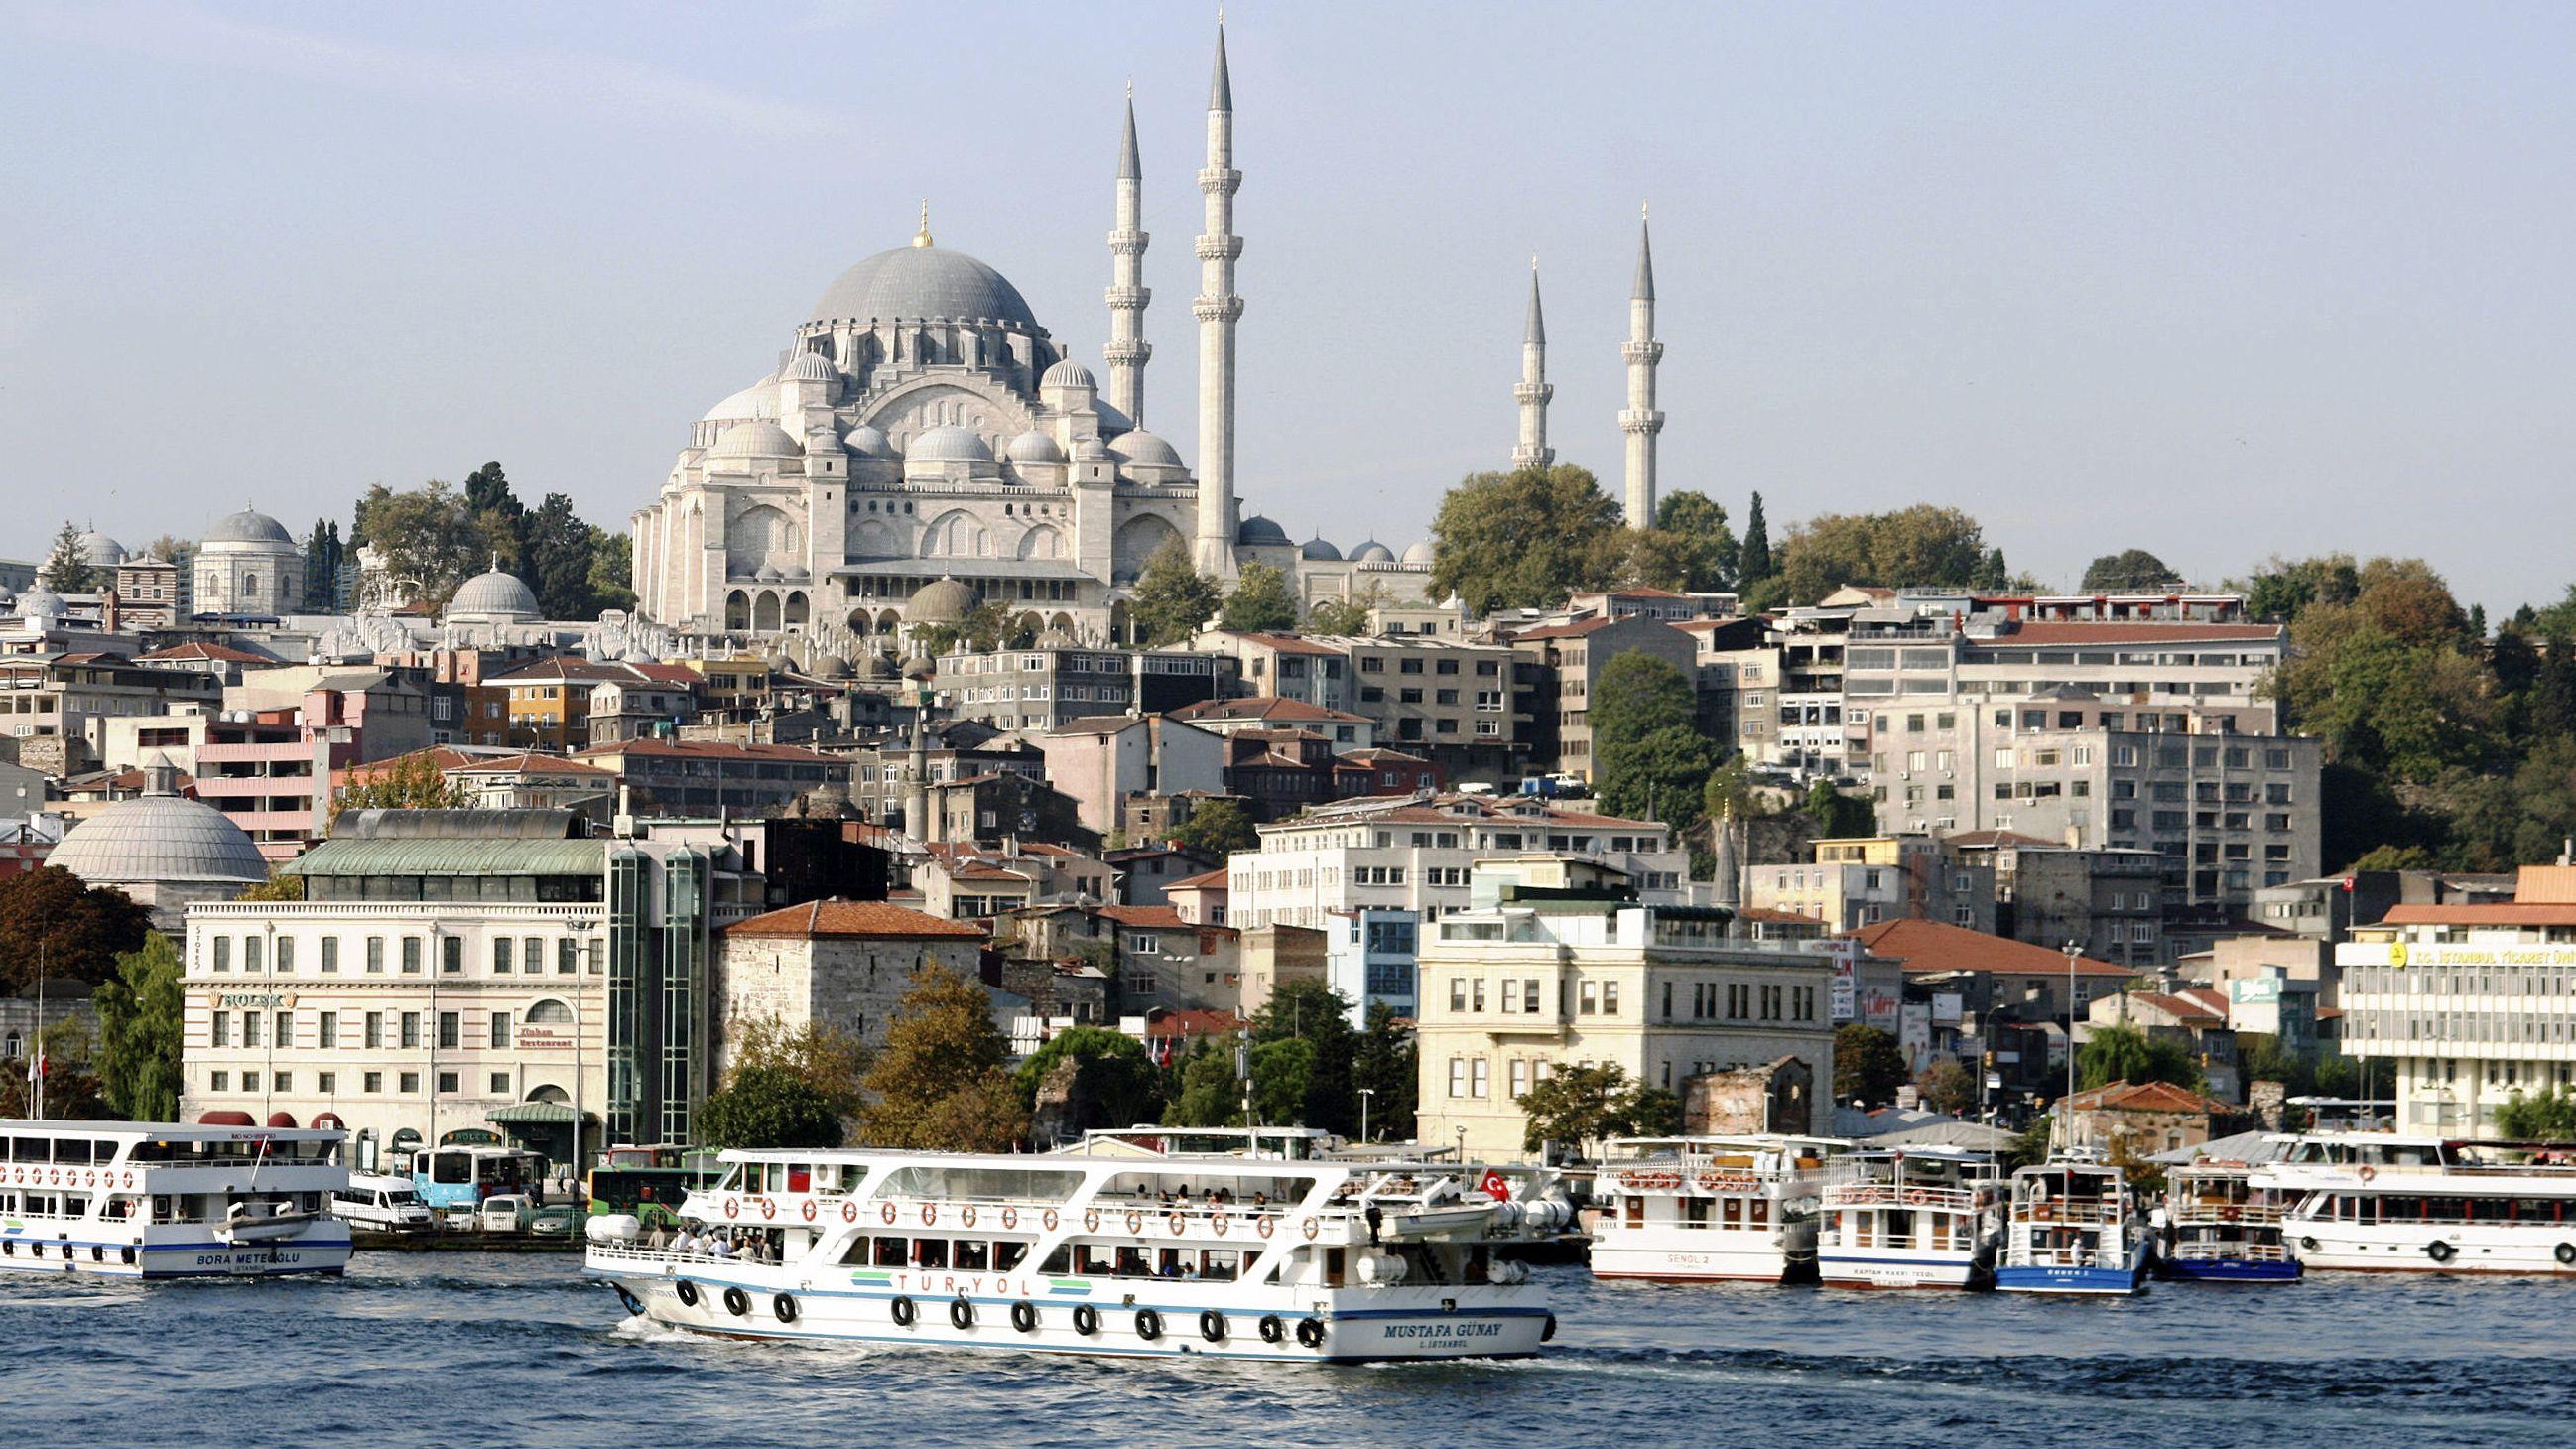 Istanbul am Bosporus mit der Hagia-Sophia-Moschee.